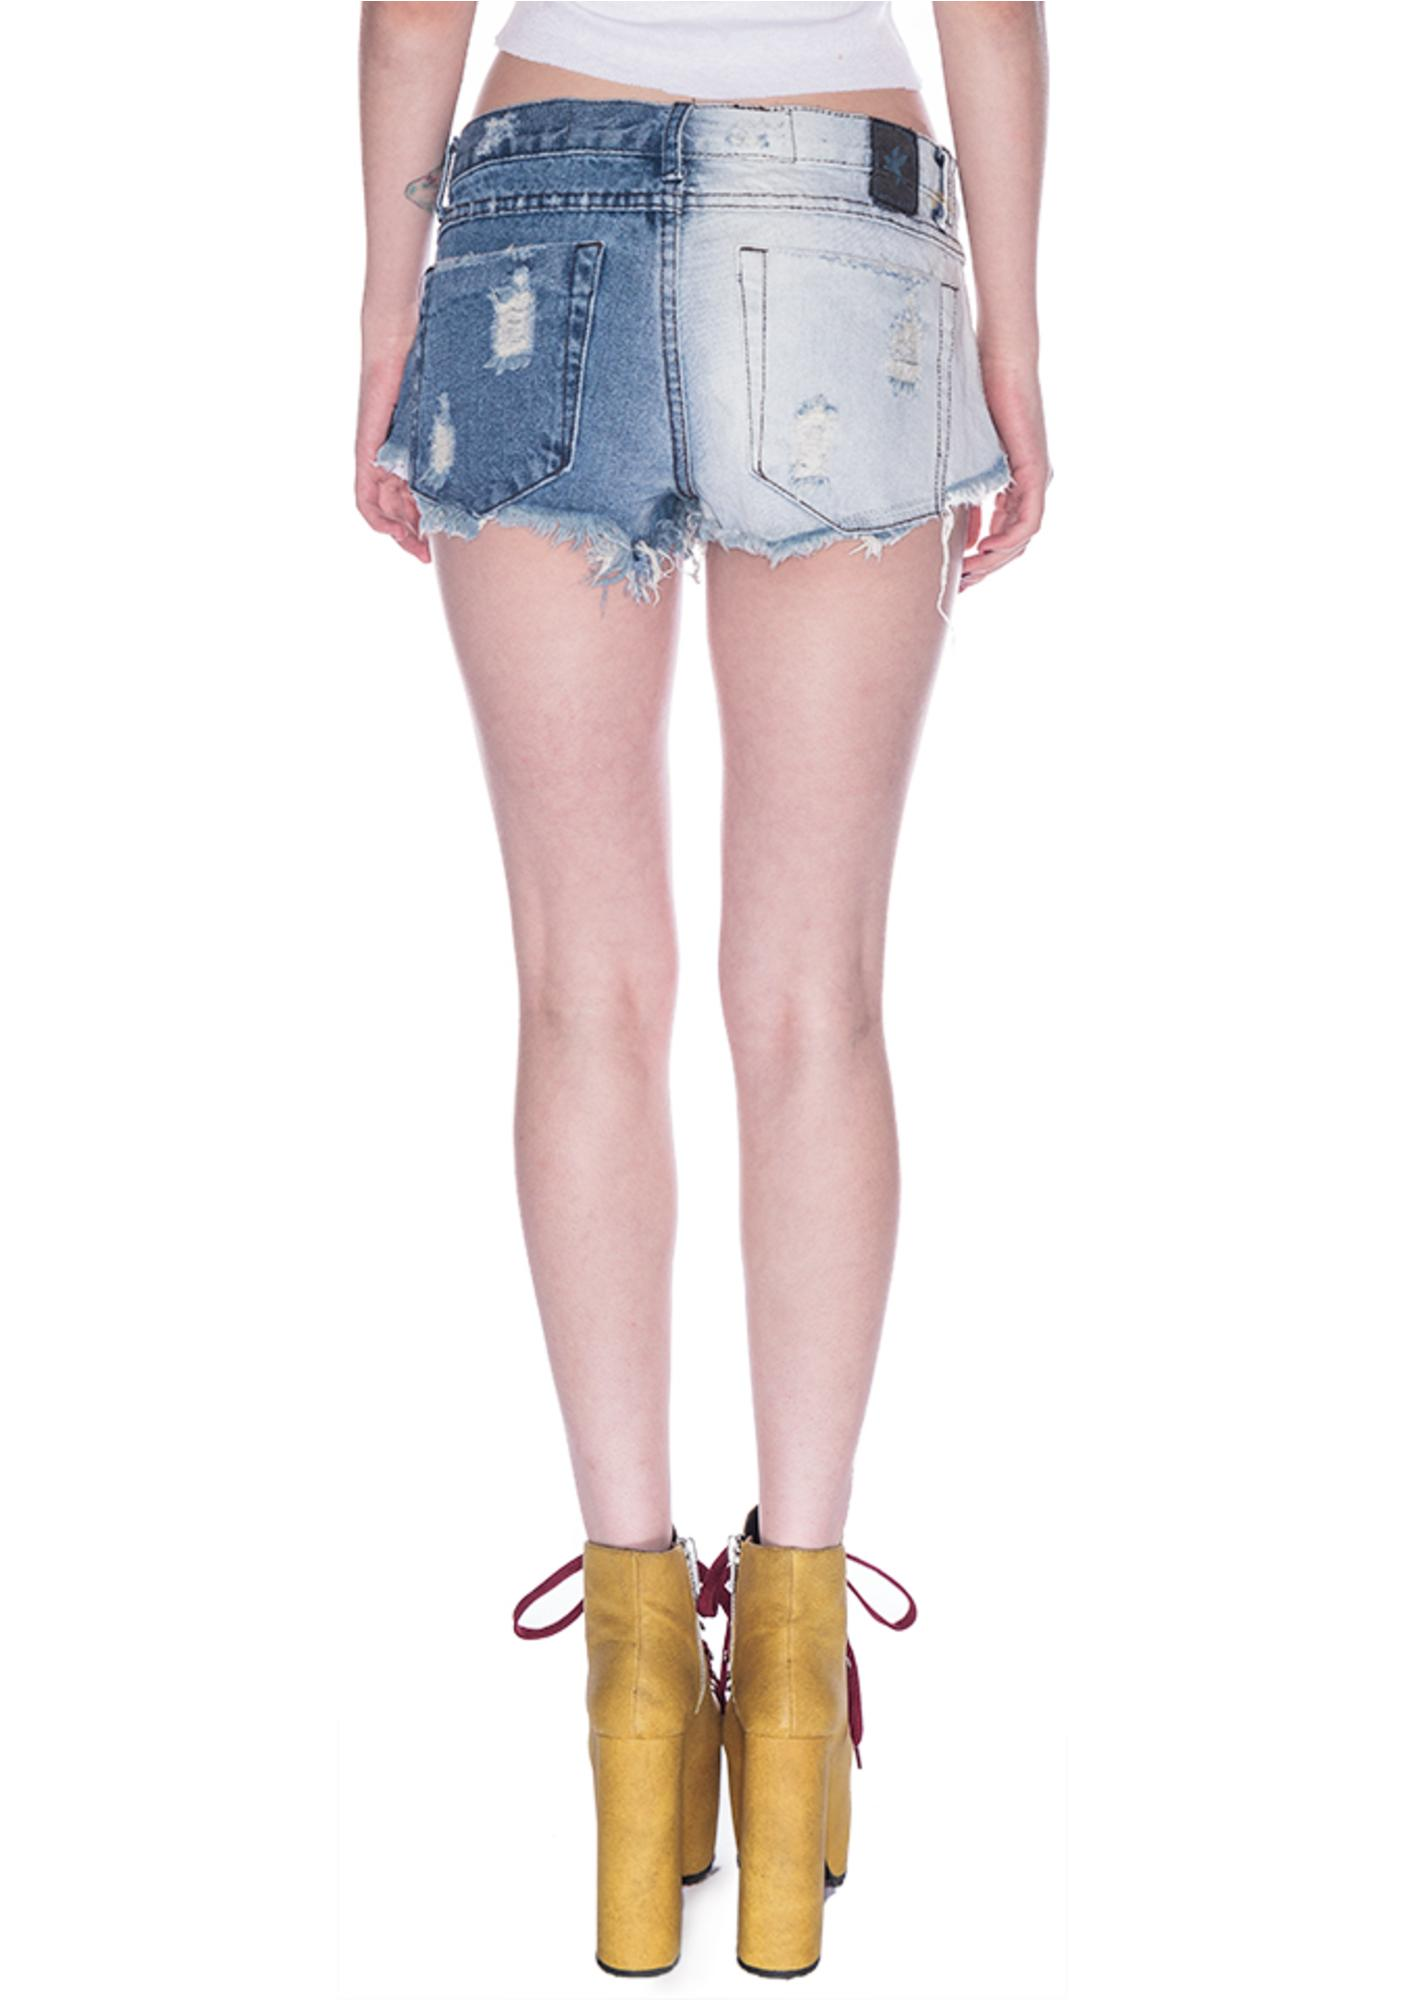 One Teaspoon Domino Trashwhores Shorts